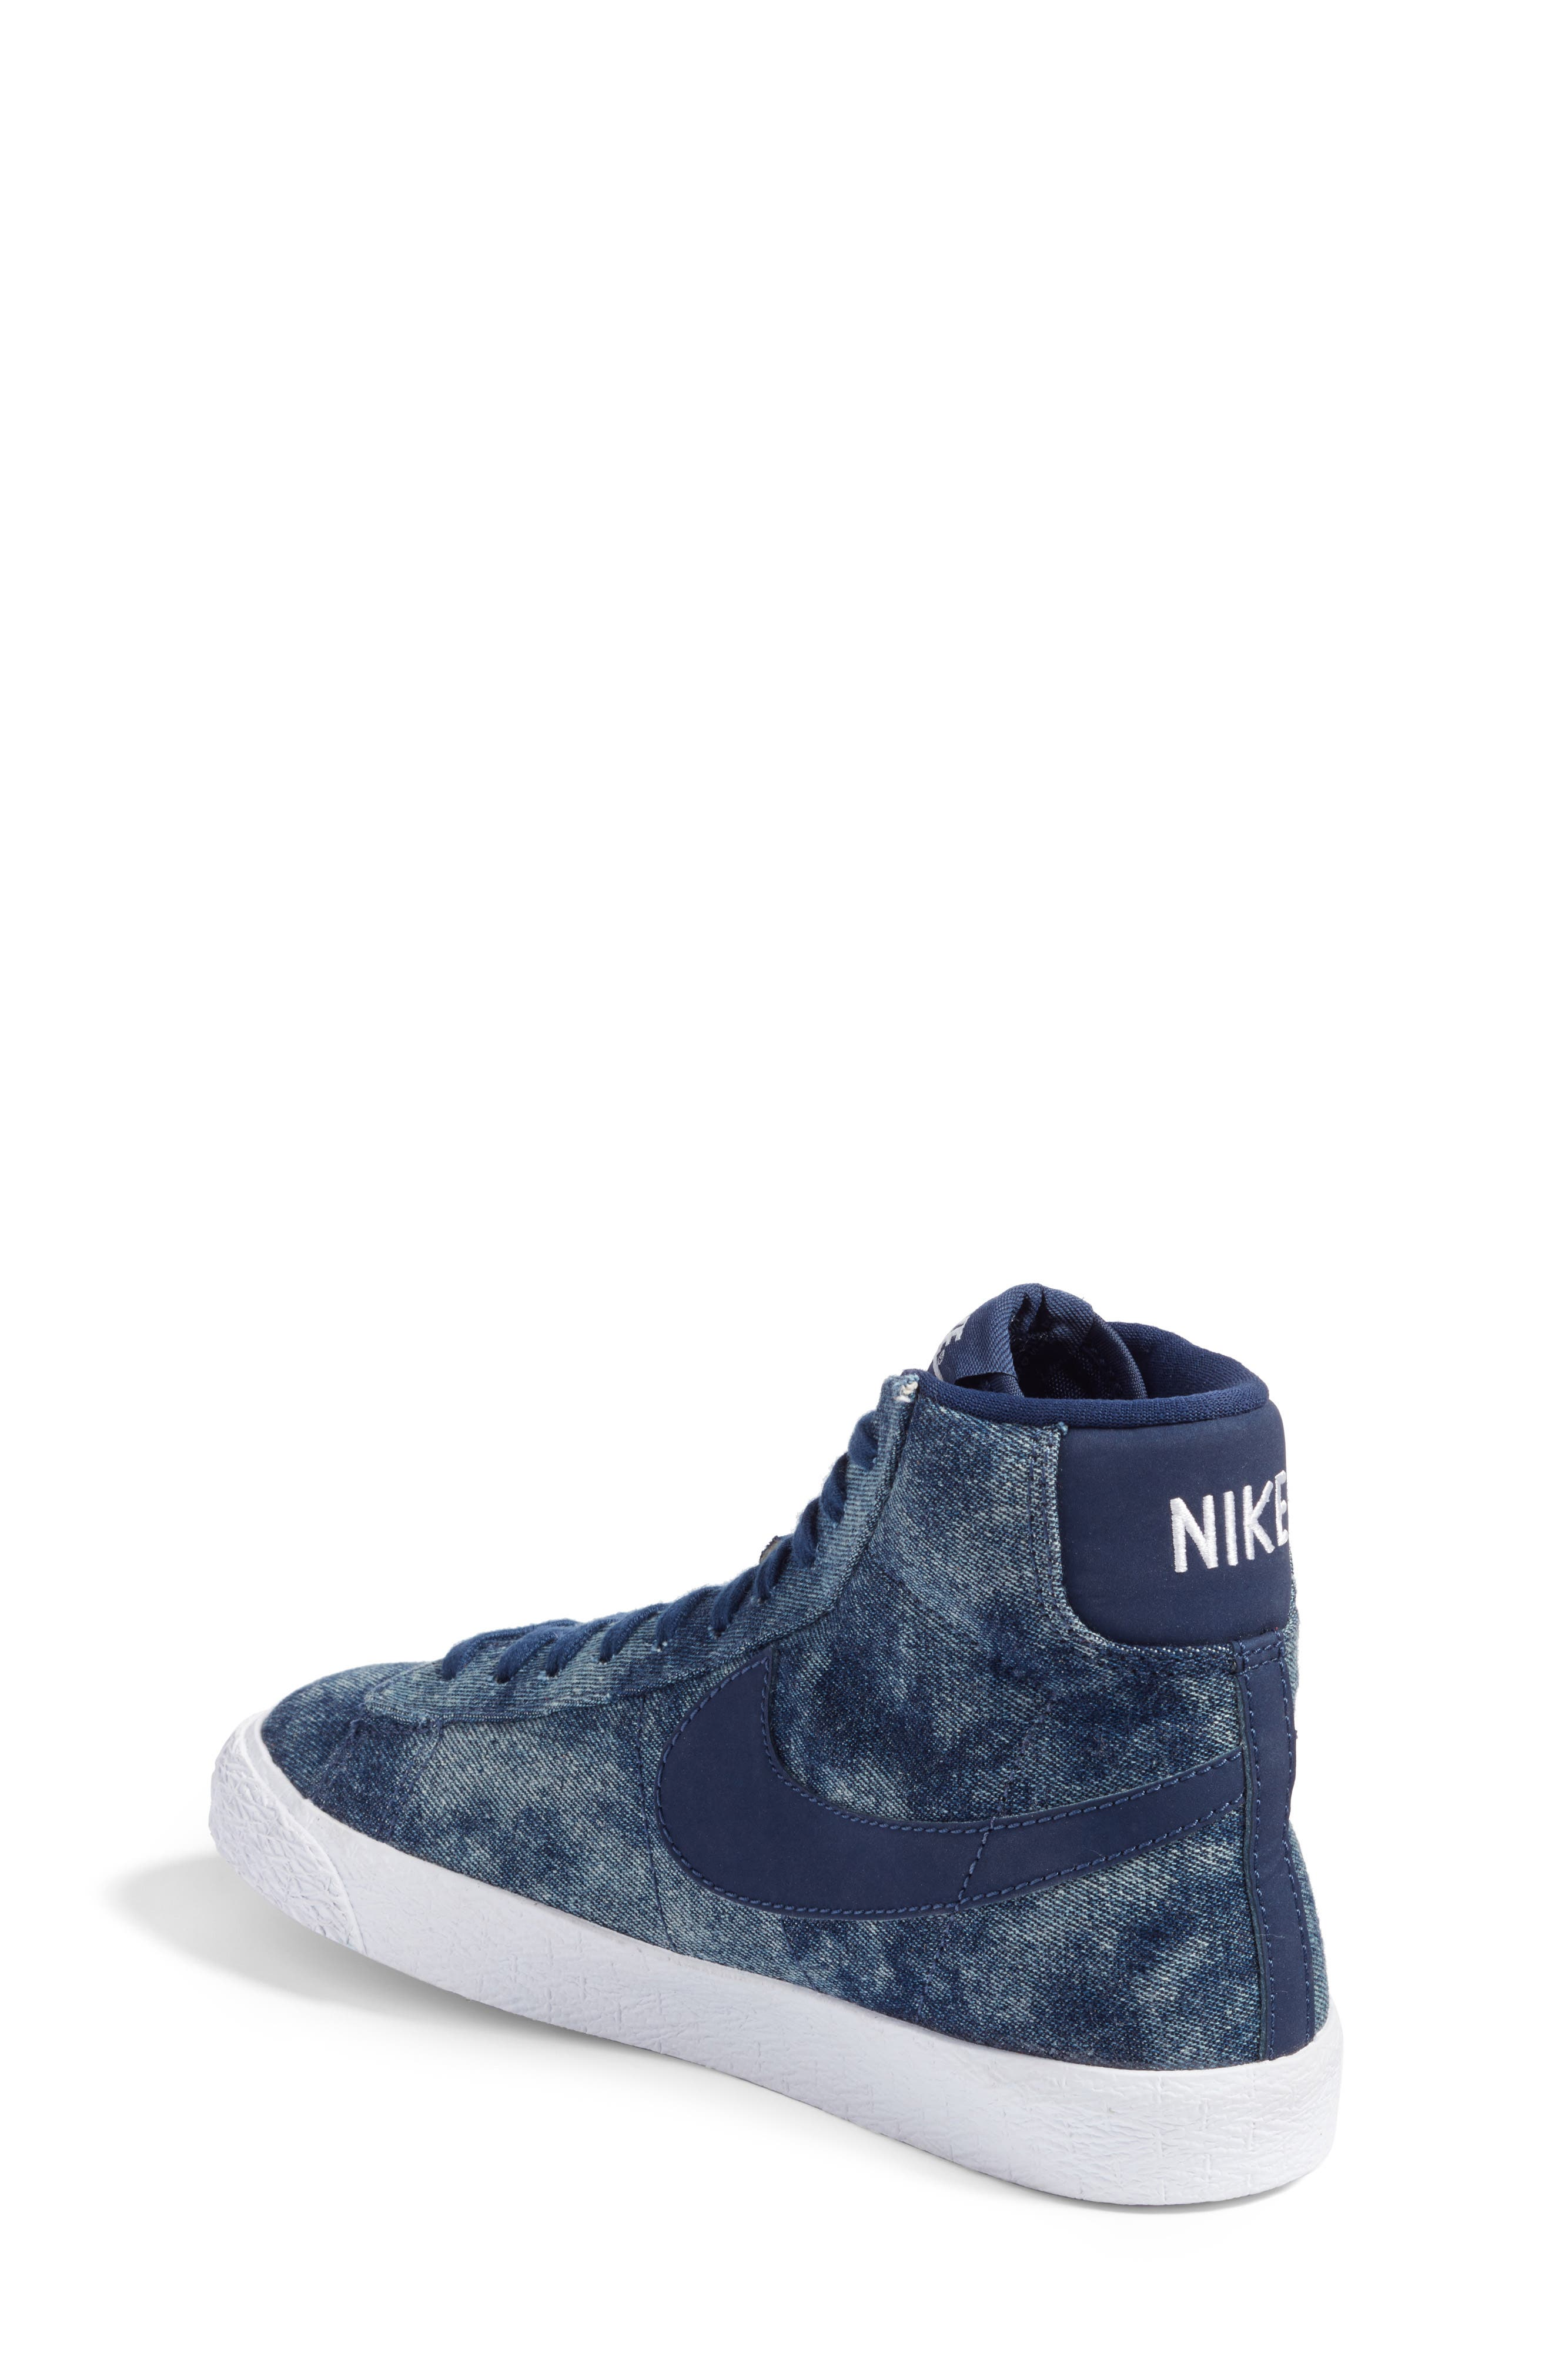 Blazer Mid SE High Top Sneaker,                             Alternate thumbnail 6, color,